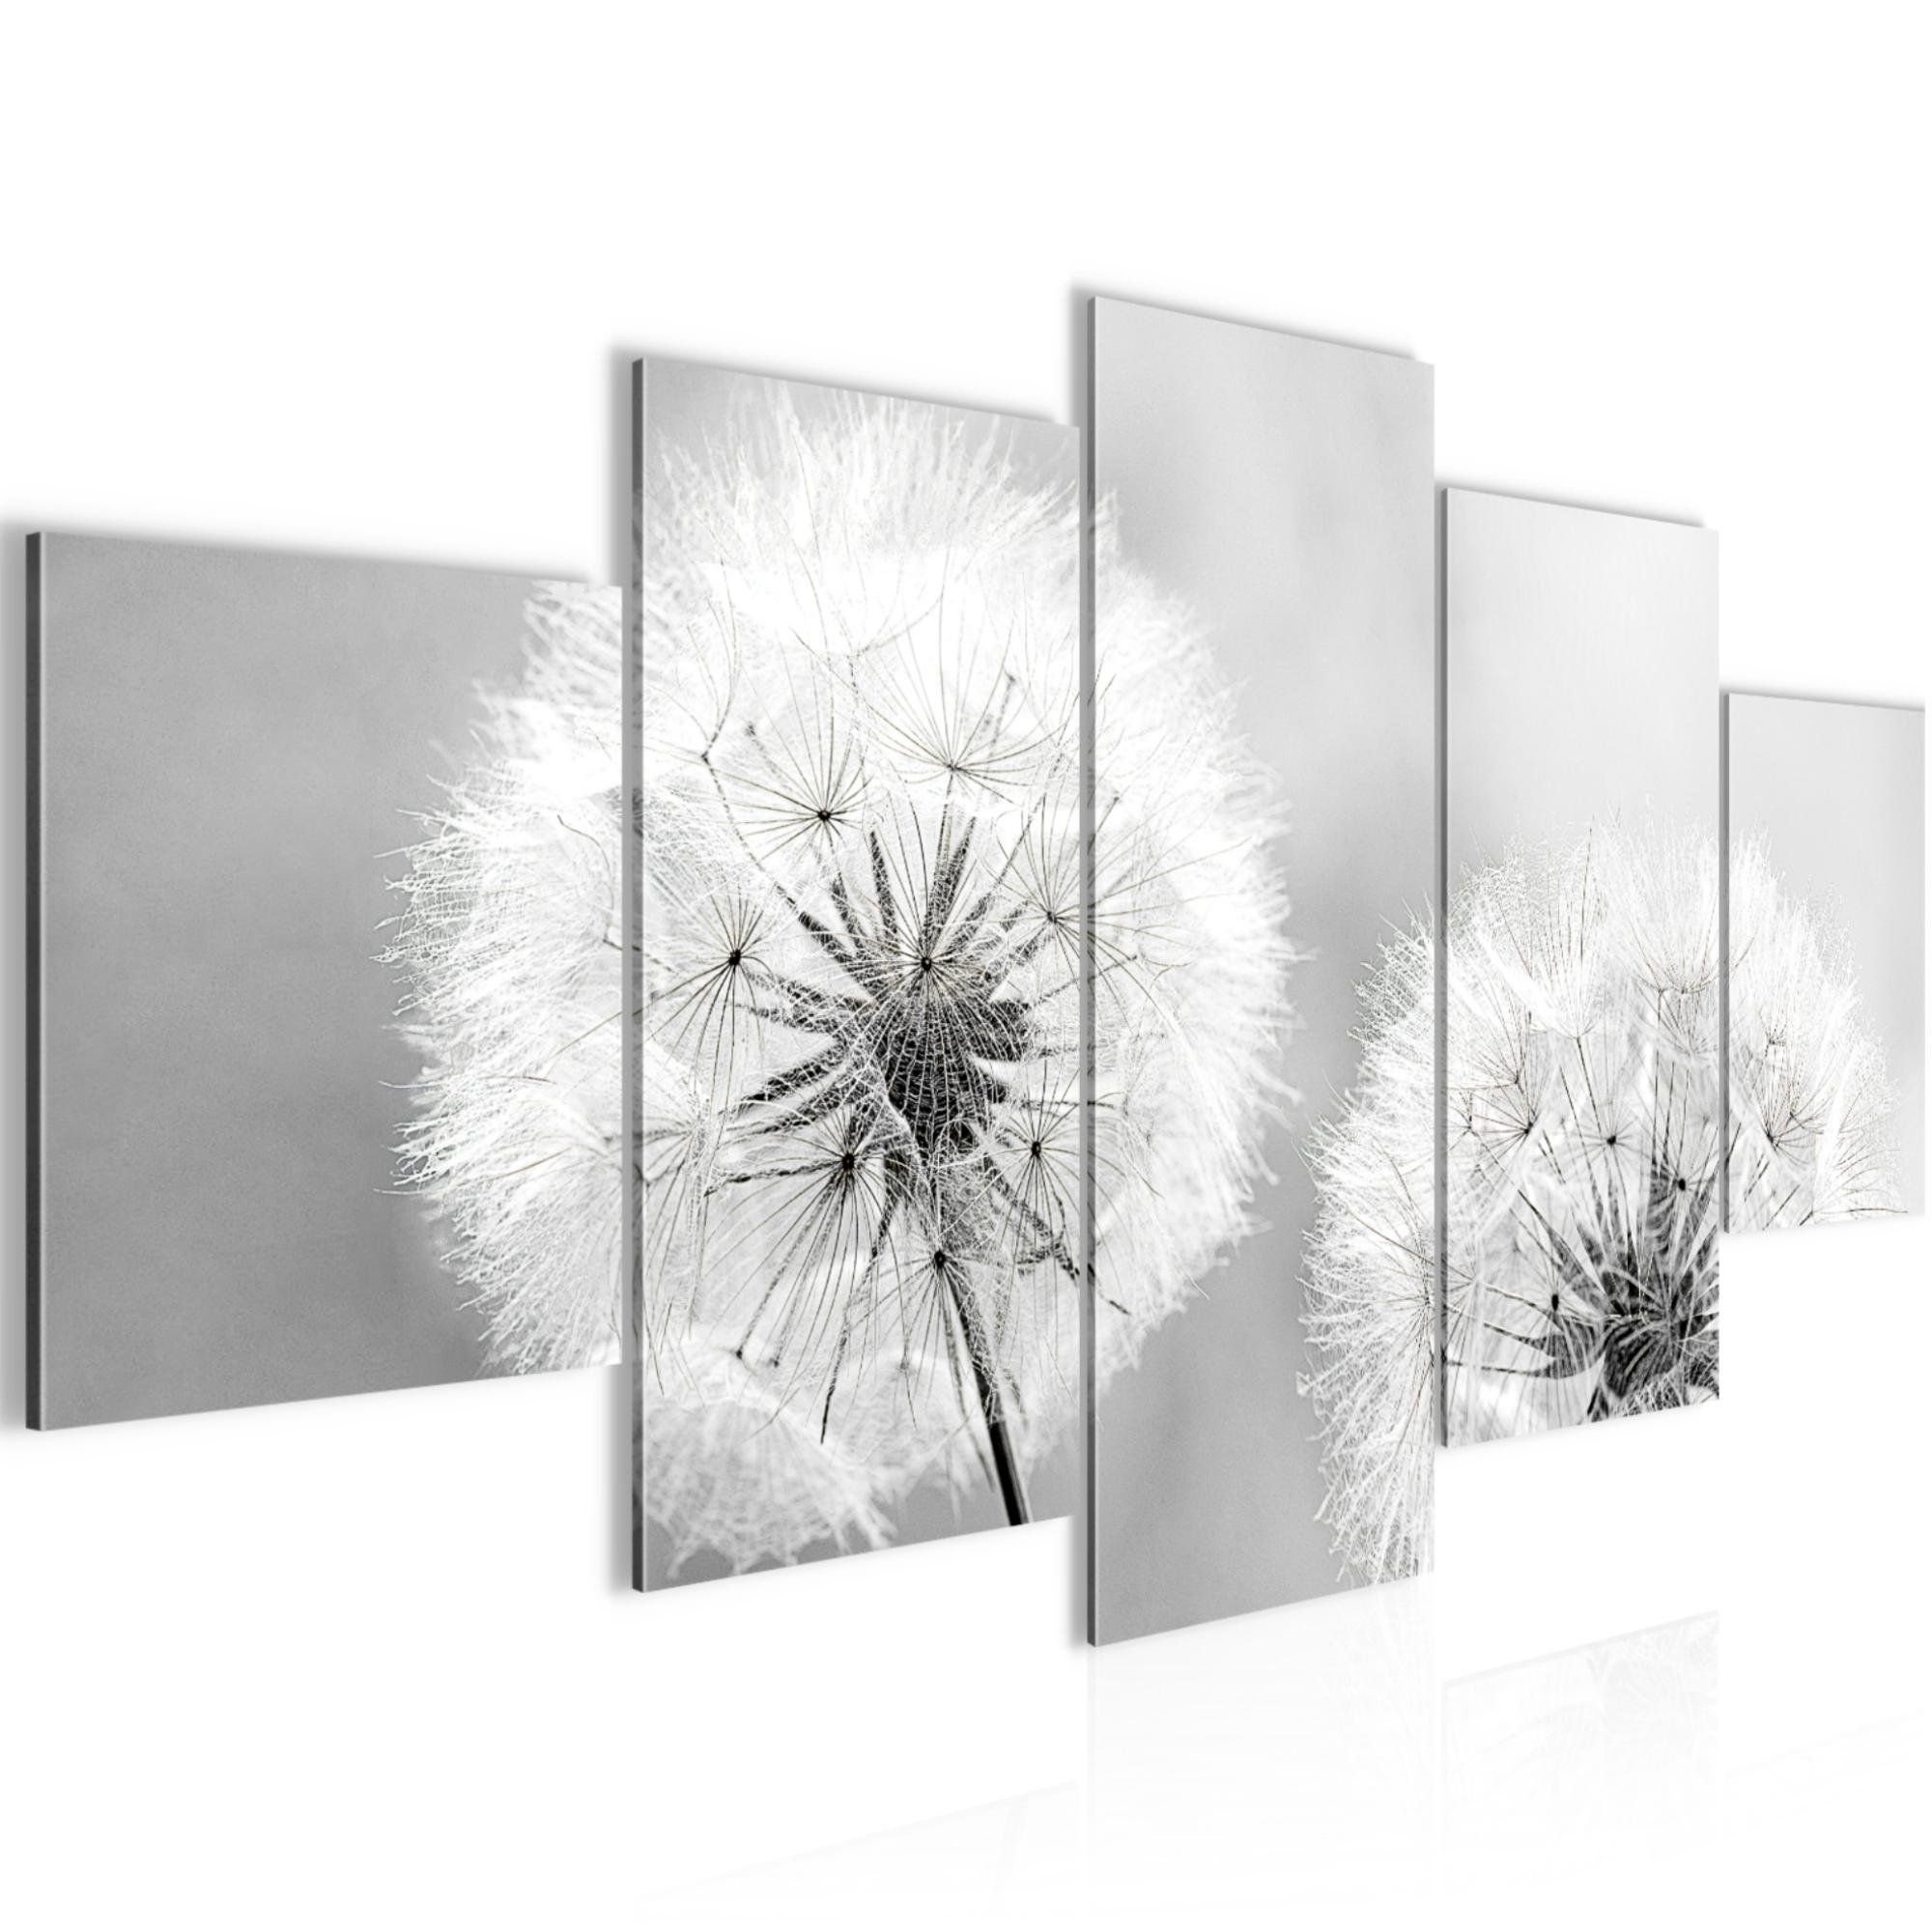 Amazon De Bilder Blumen Pusteblume Wandbild 200 X 100 Cm Vlies Leinwand Bild Xxl Format Wandbilder Kunstdrucke Pusteblume Wandbi Decor Home Decor Tapestry